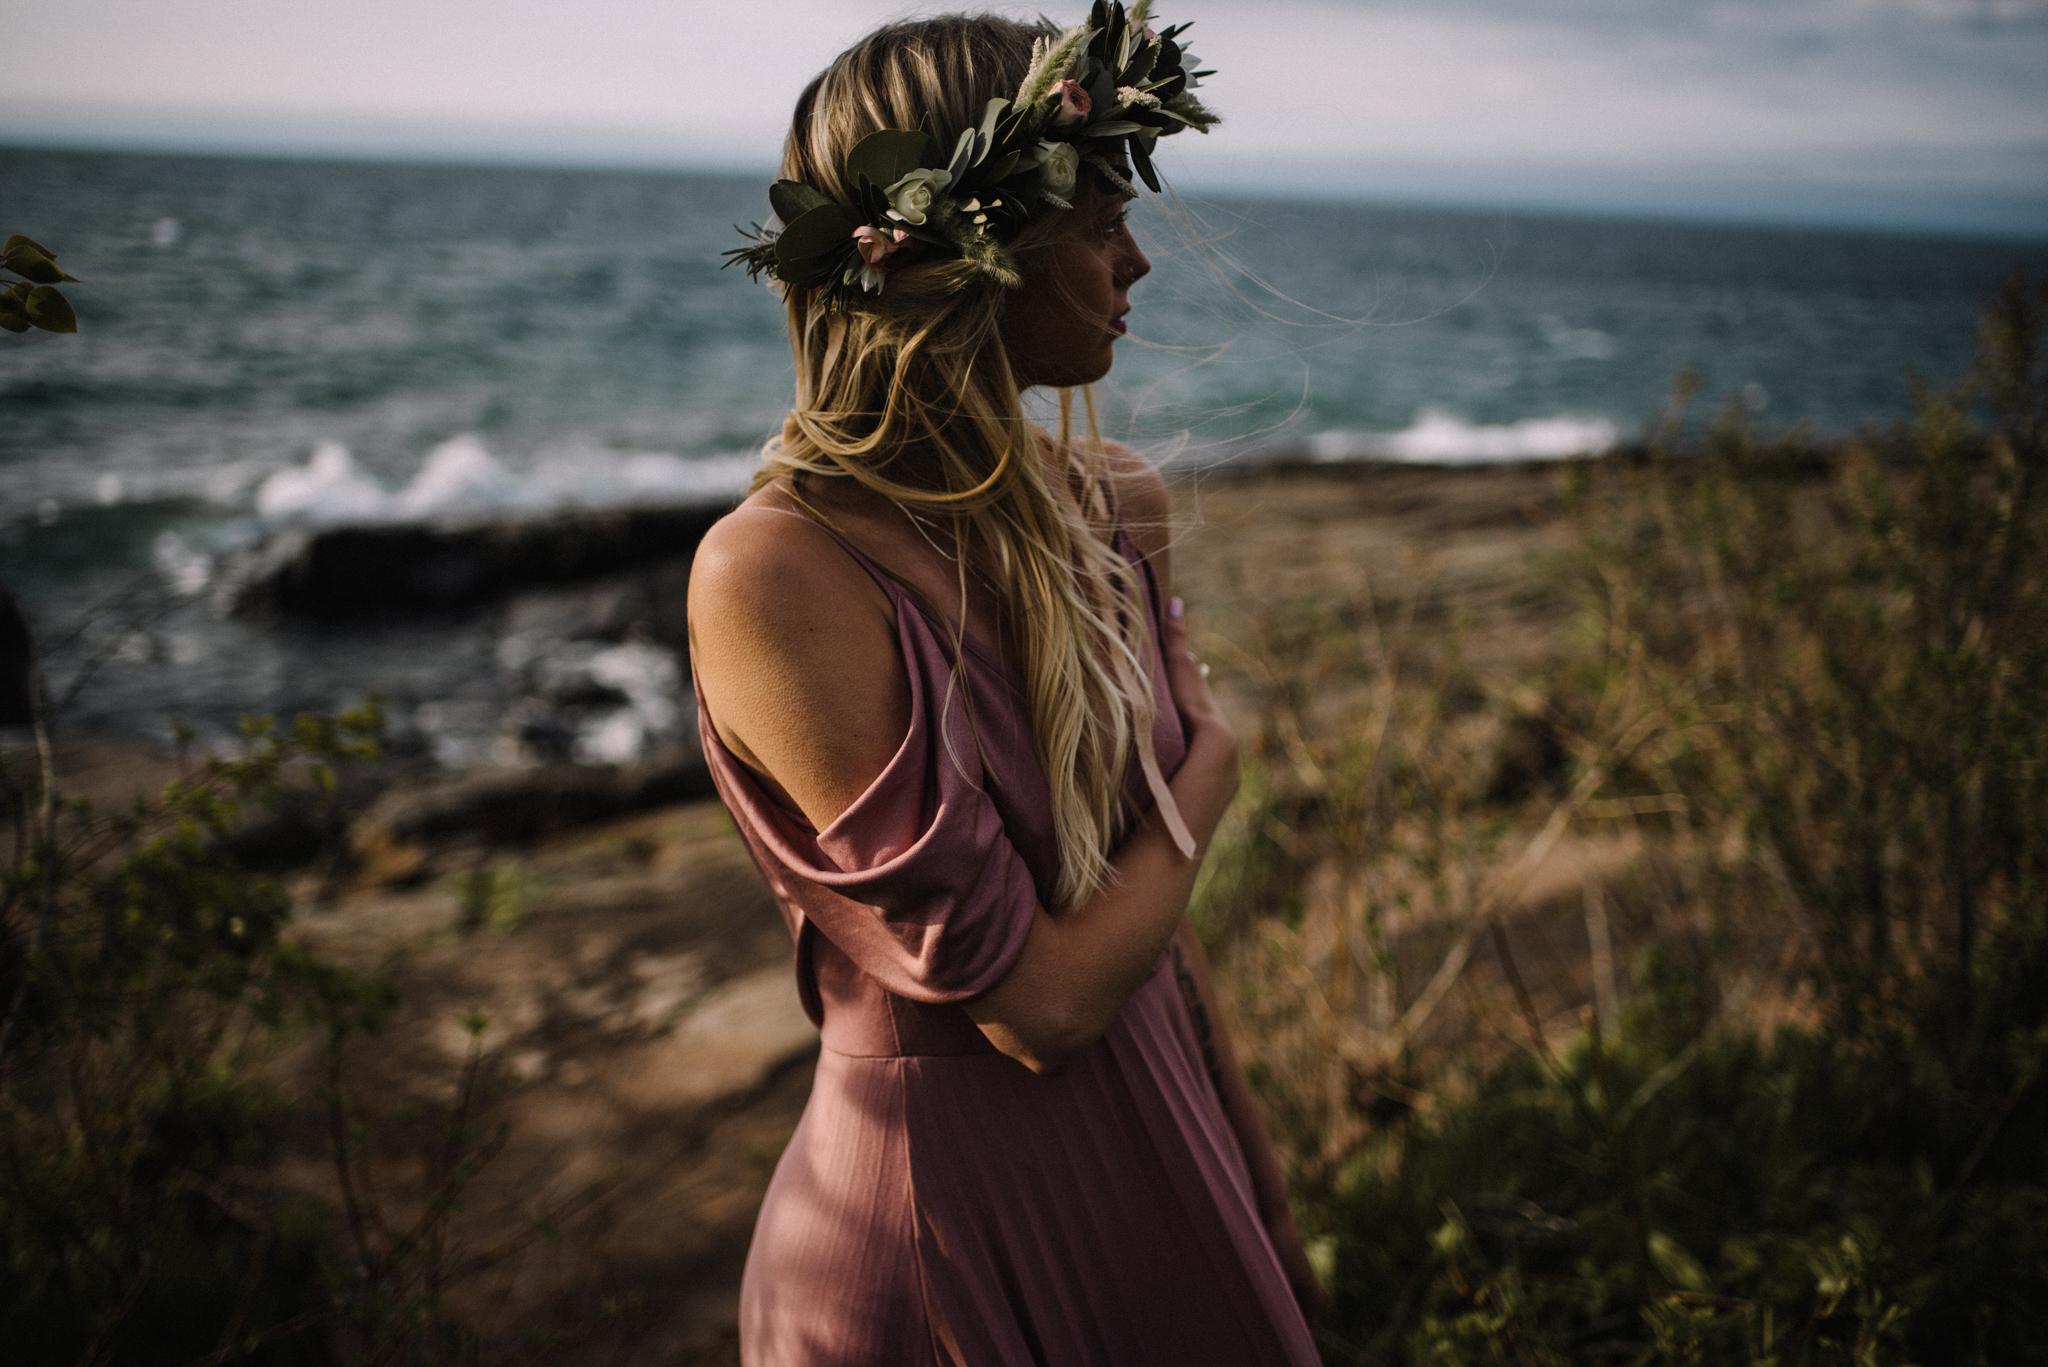 Madeira Creative - Clare Kolars - Emilee Bridal Portraits - White Sails Photography - North Shore - Lake Superior_81.JPG